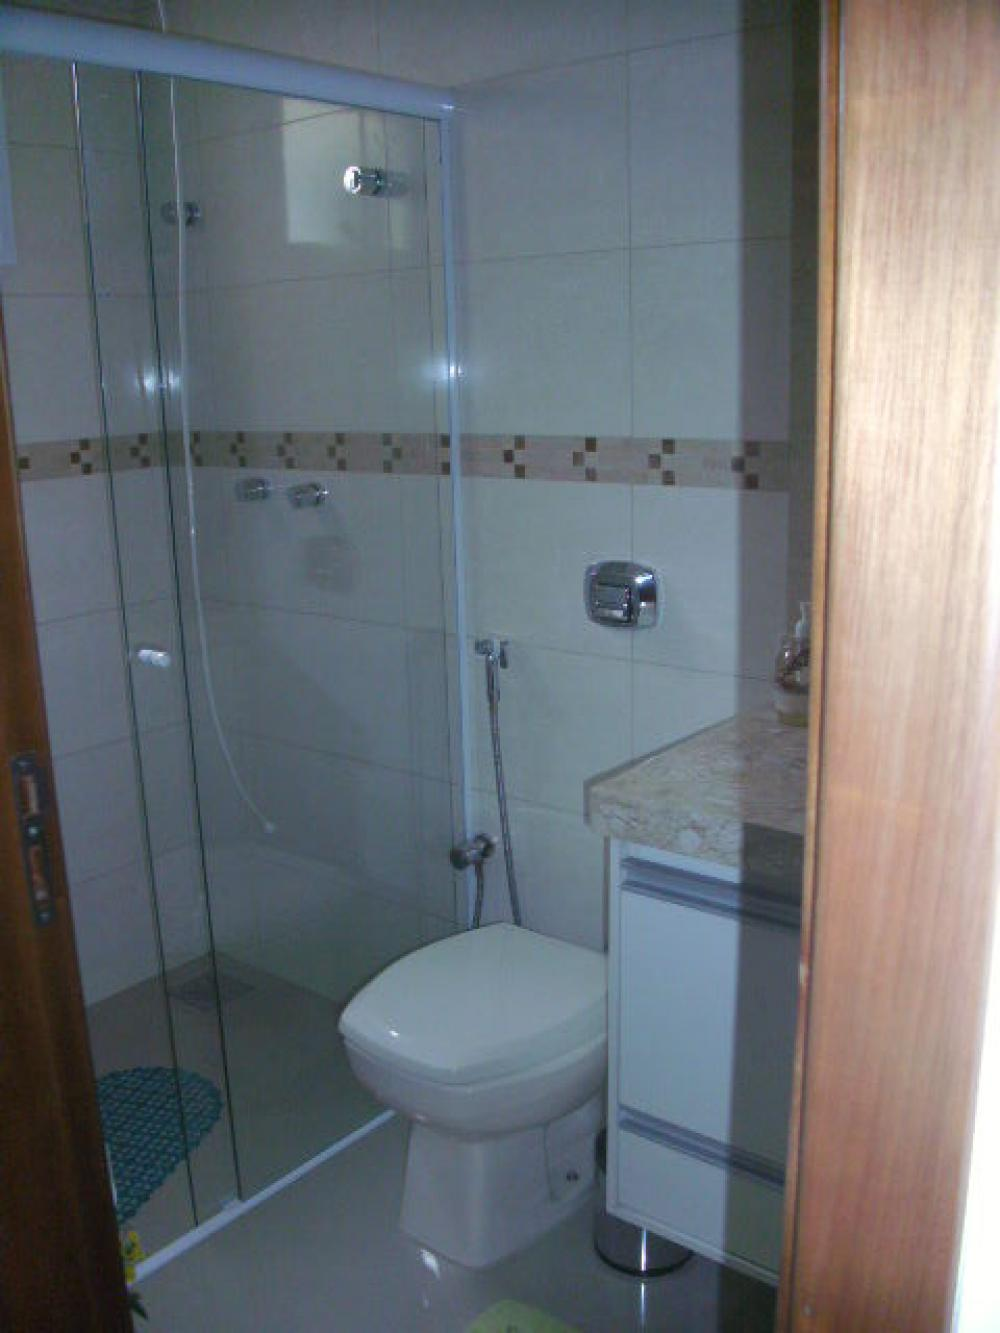 Comprar Casa / Condomínio em Mirassol R$ 750.000,00 - Foto 18